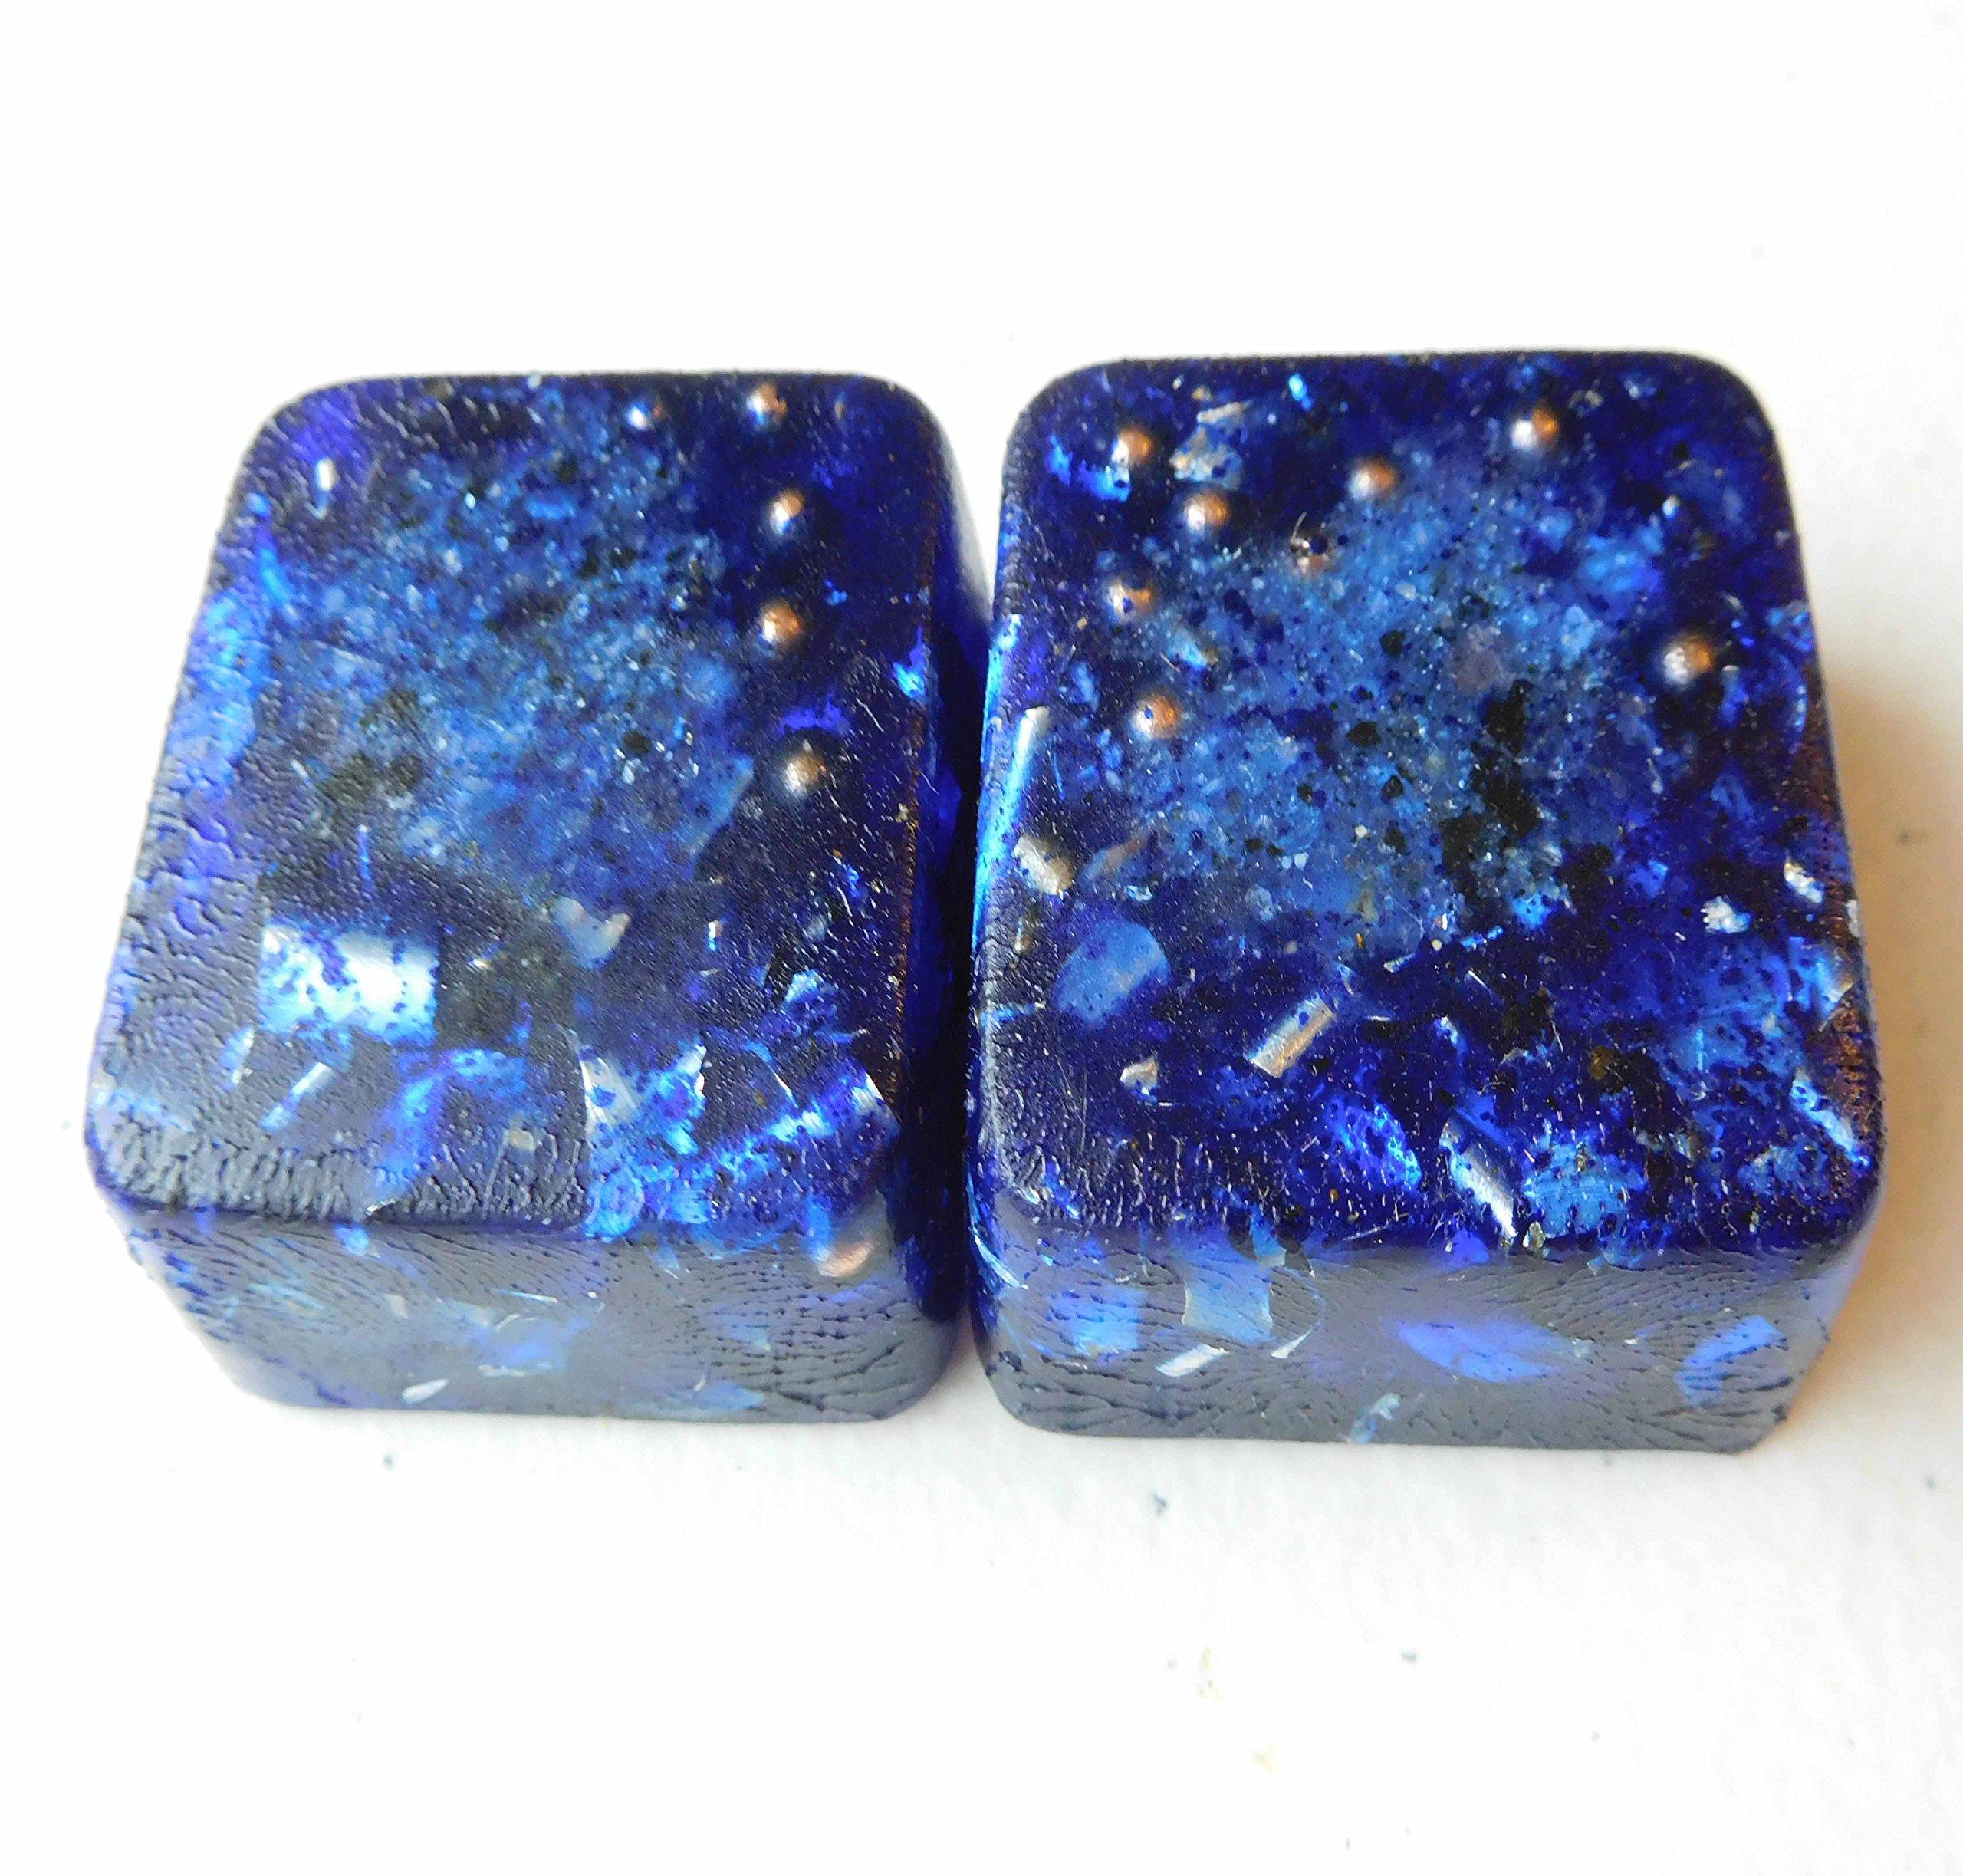 Blue Ultramarine 2 Mini Cube Tower Busters Crystal Orgone Generator Energy Accumulator 528Hz/7.83Hz/Advance Harmonics Many Beautiful Ingredients and Colors!! (Blue Ultramarine)